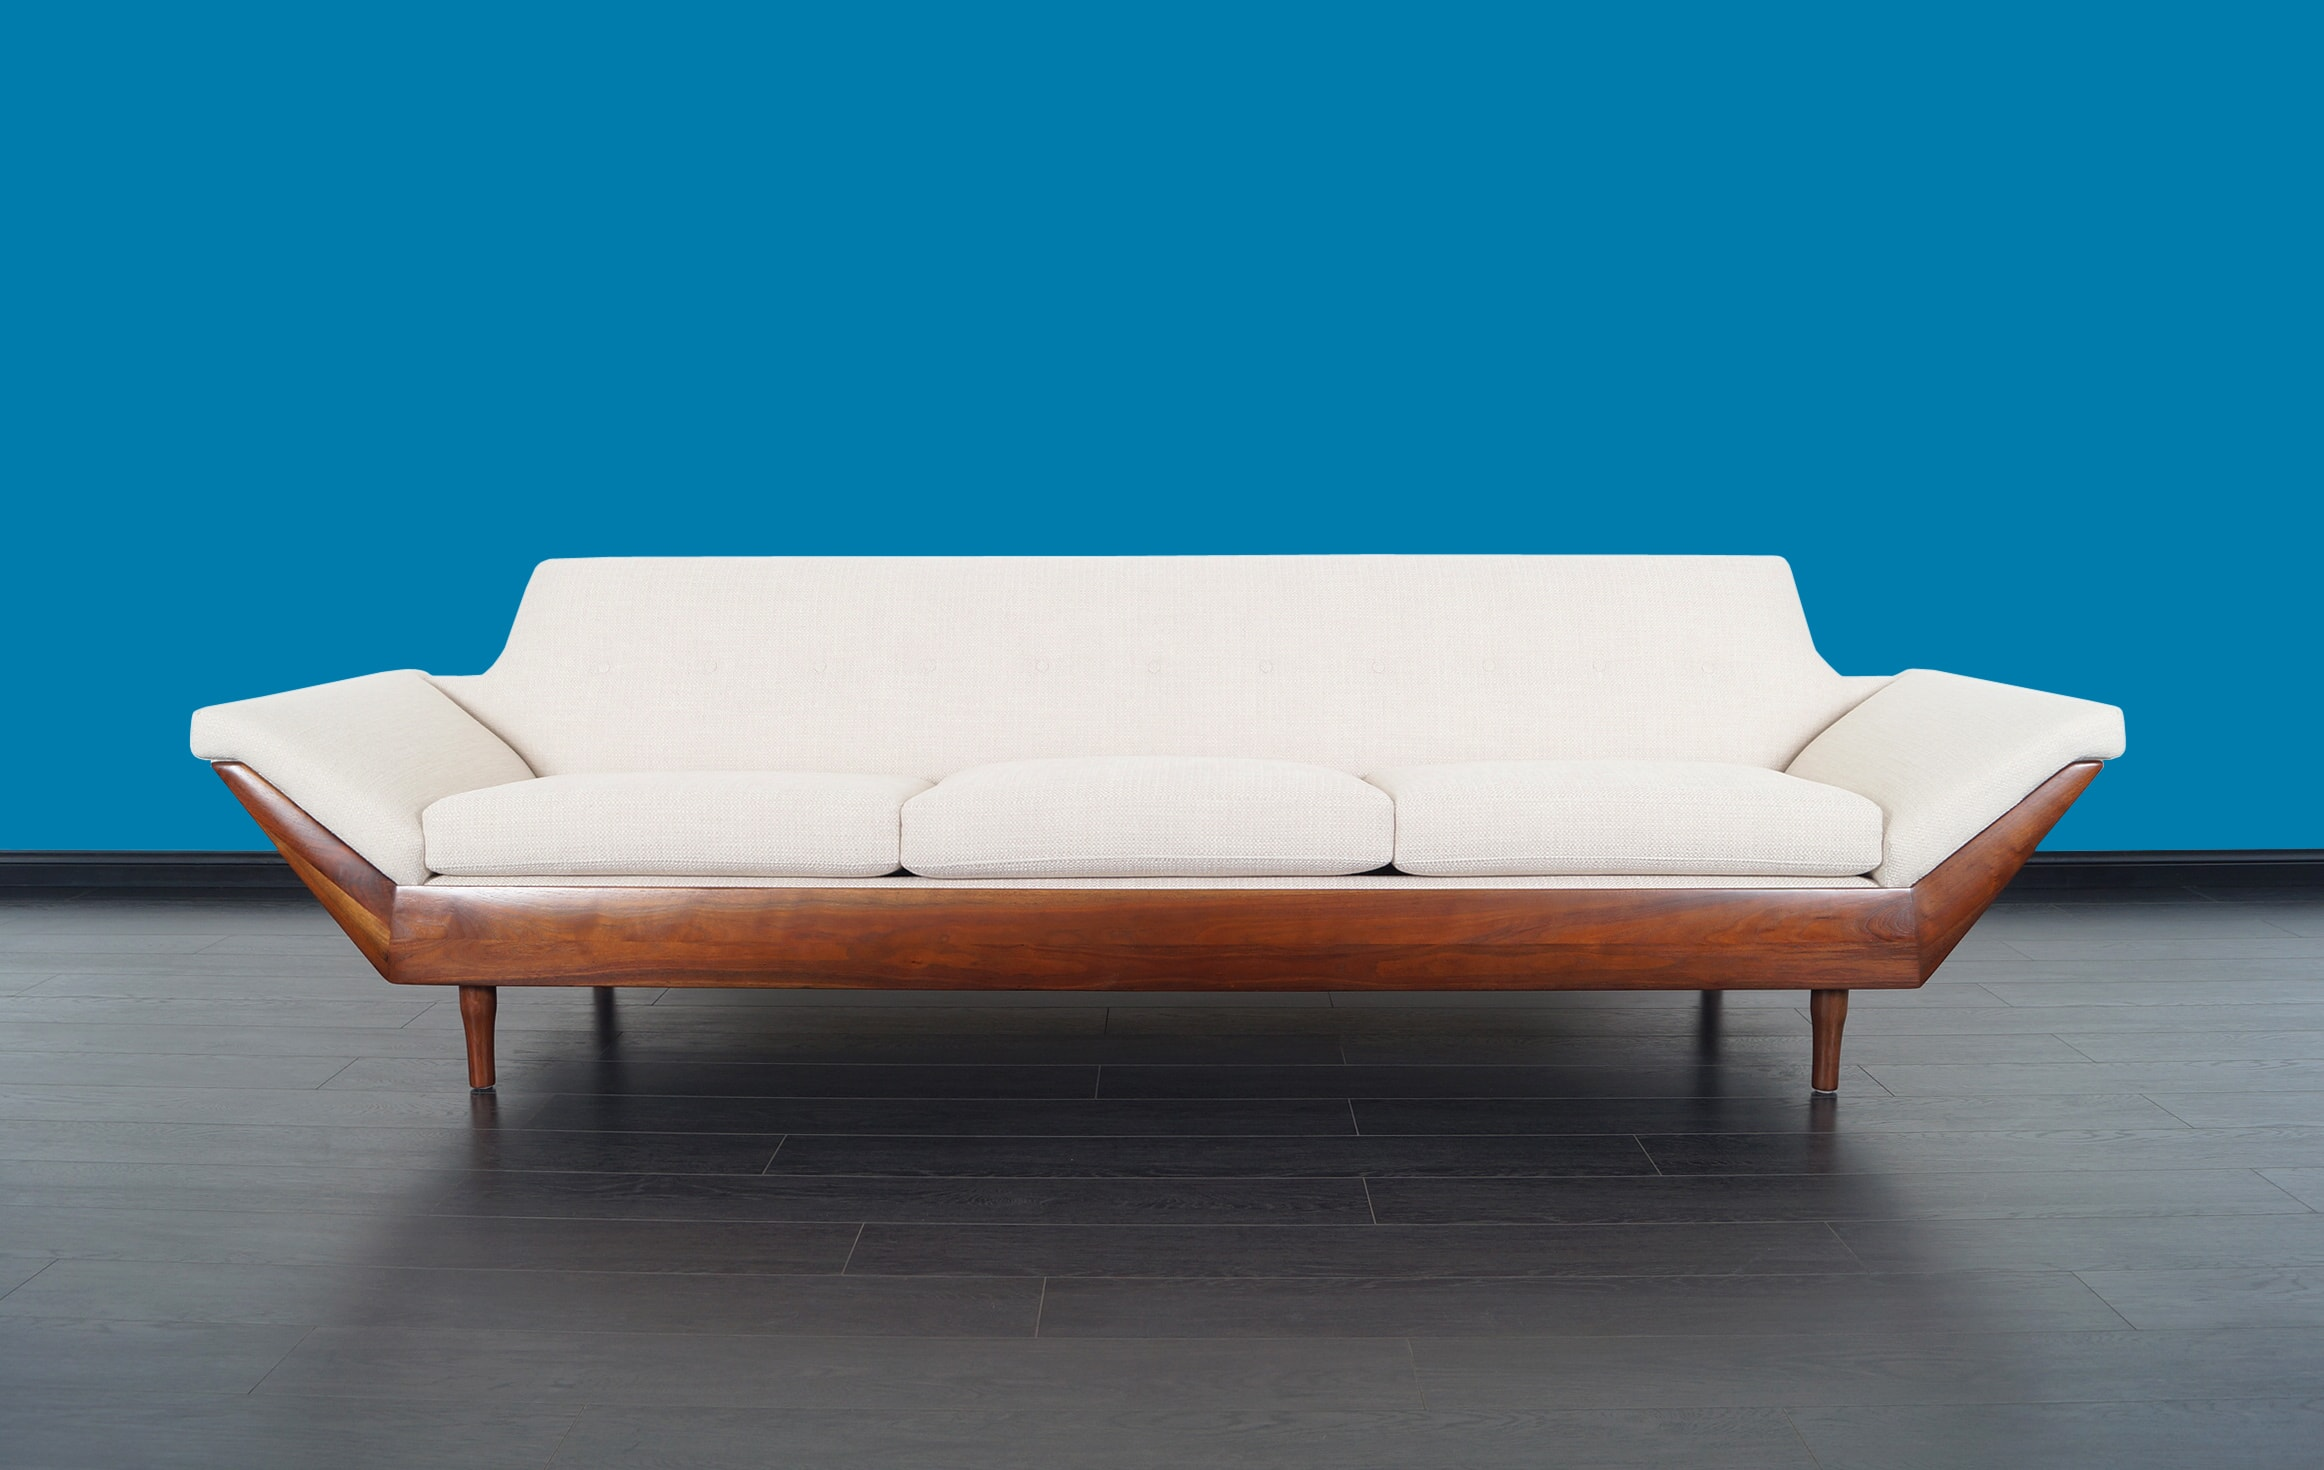 Sculptural Thunderbird Sofa by Flexsteel